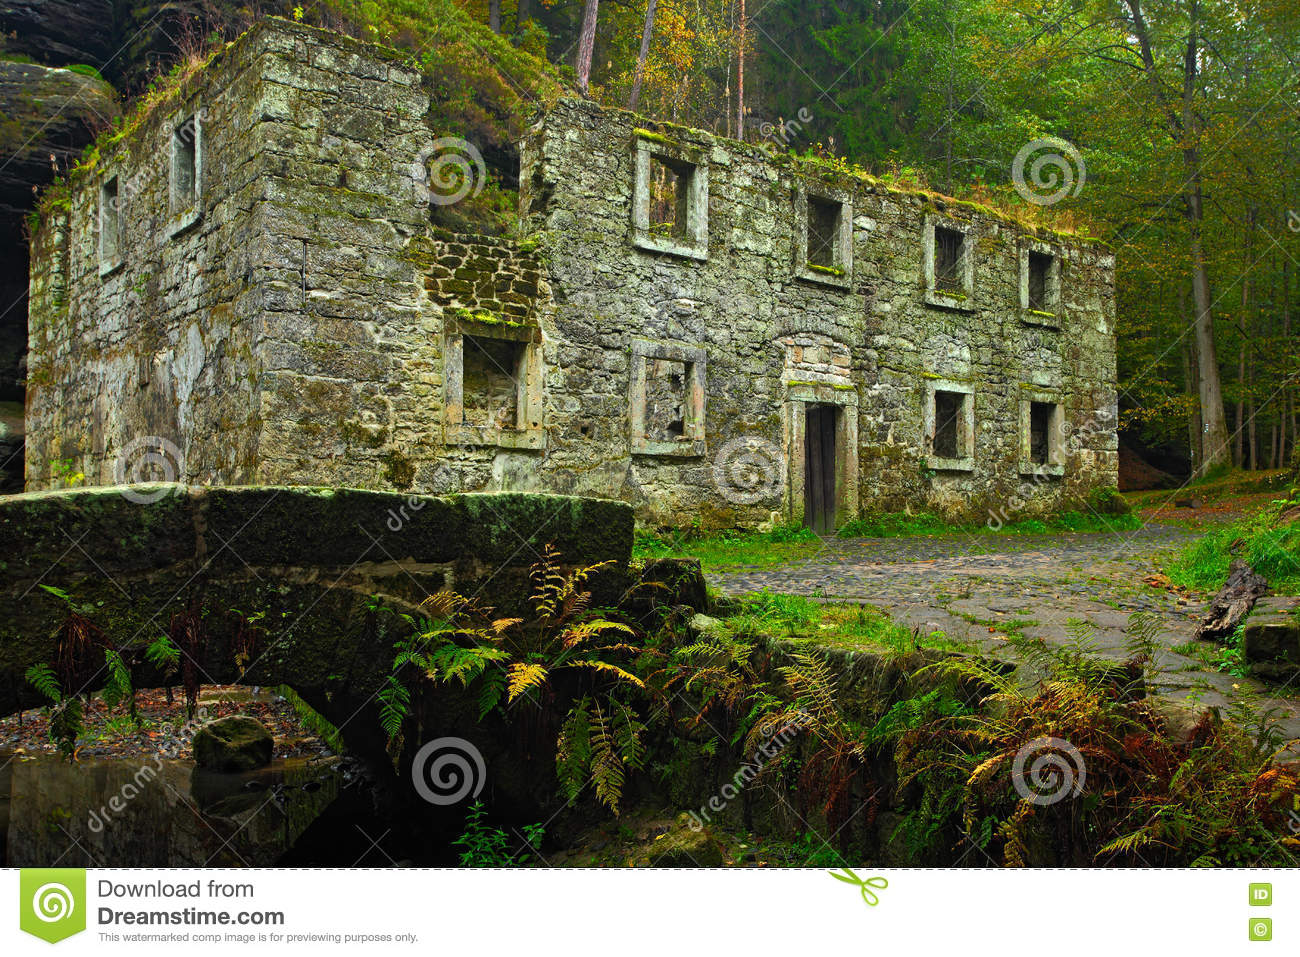 Old Ruin Dolsky Mlyn With Kamenice River, National Park Bohemian.